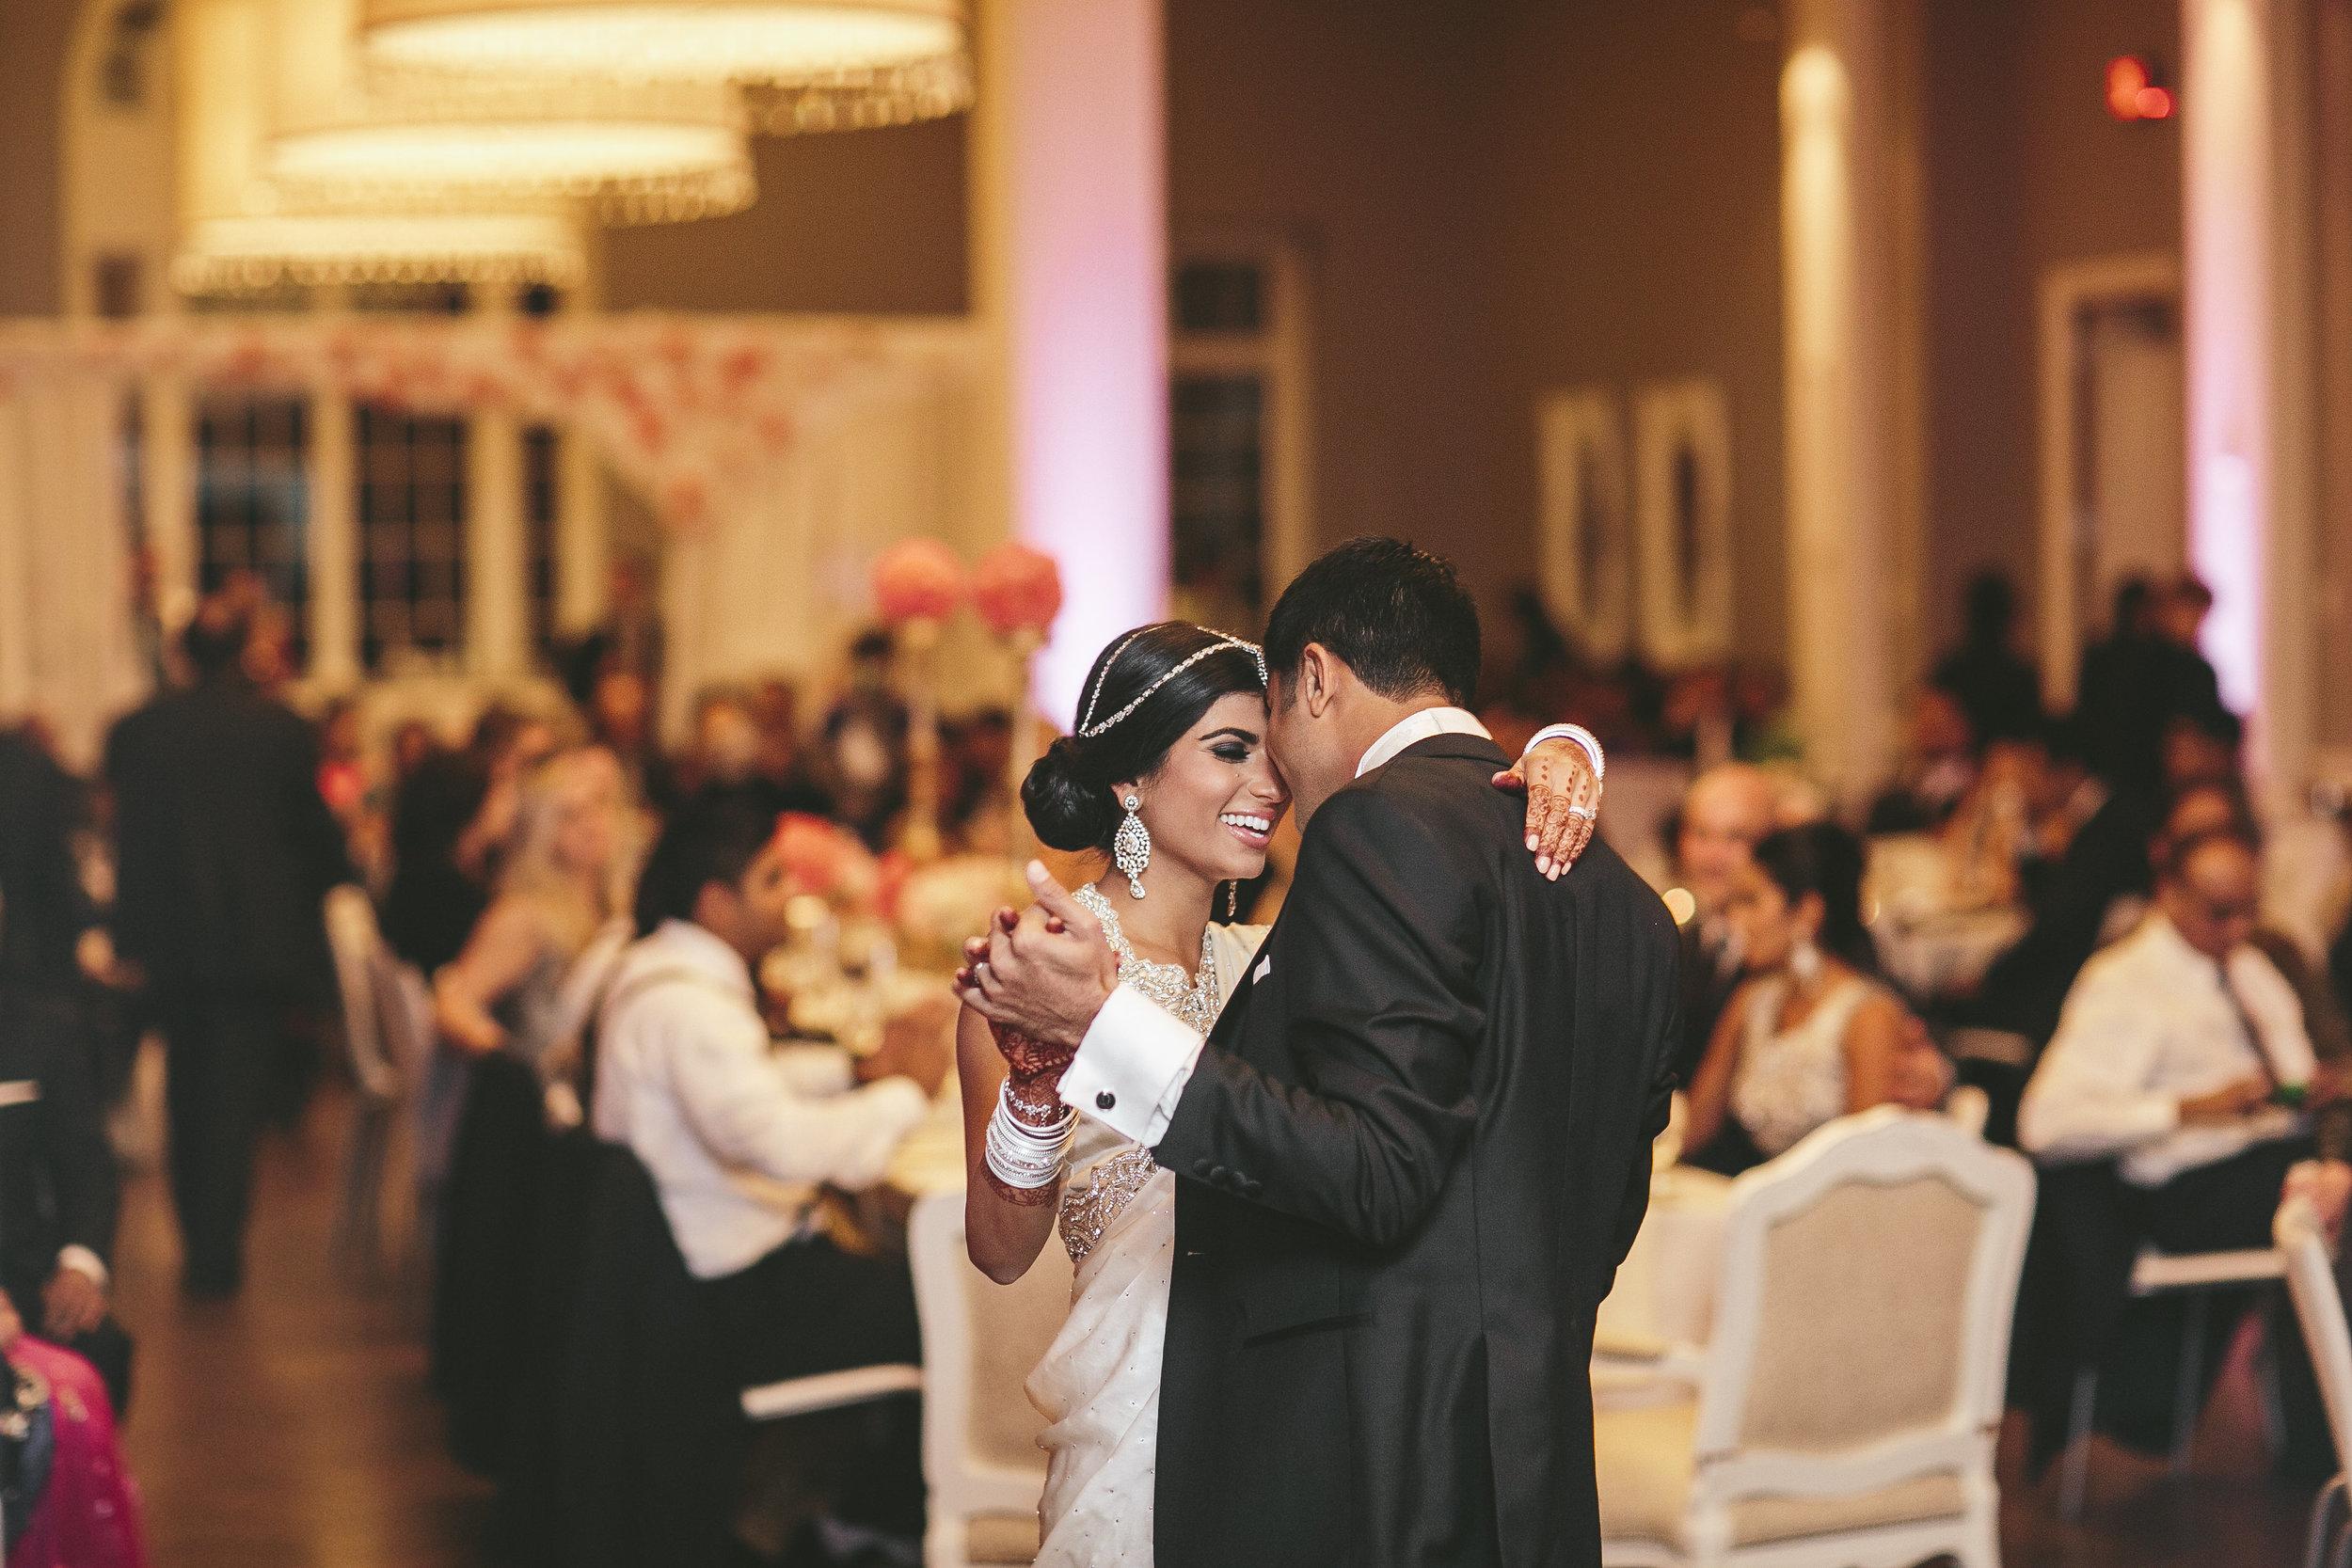 Acowsay_Minnesota_Wedding_Video_First_Dance.JPG